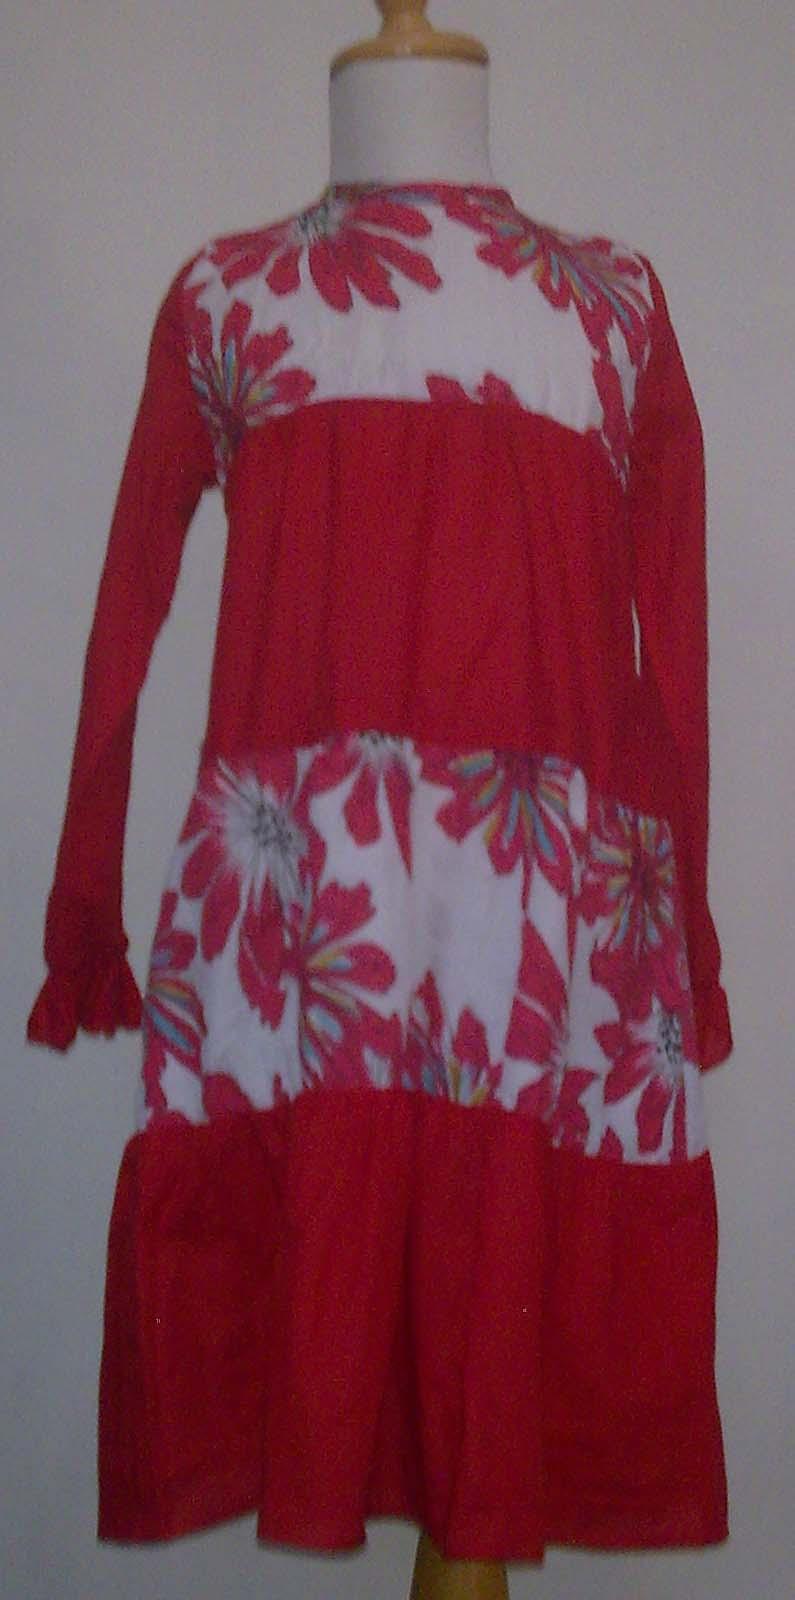 L U C K 29 Baju Merah Putih